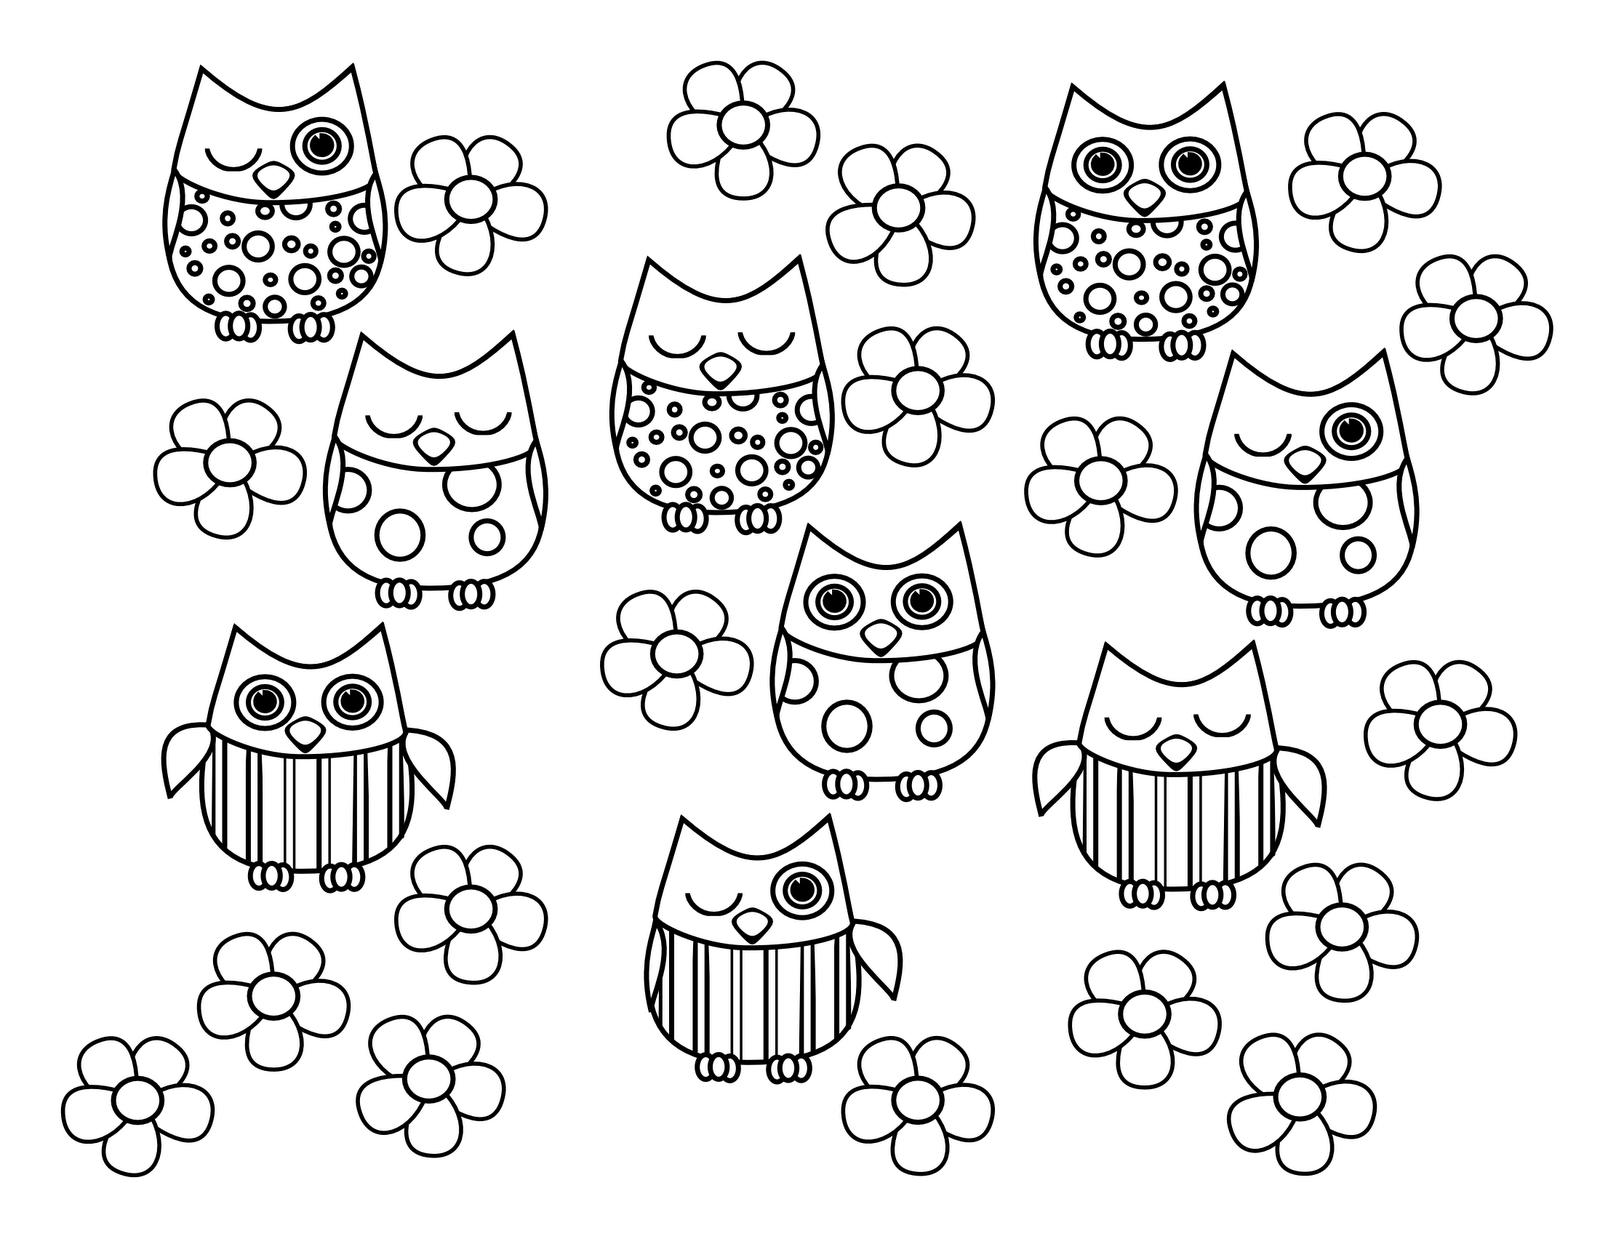 baby owl coloring pages baby owl coloring pages getcoloringpagescom owl coloring pages baby